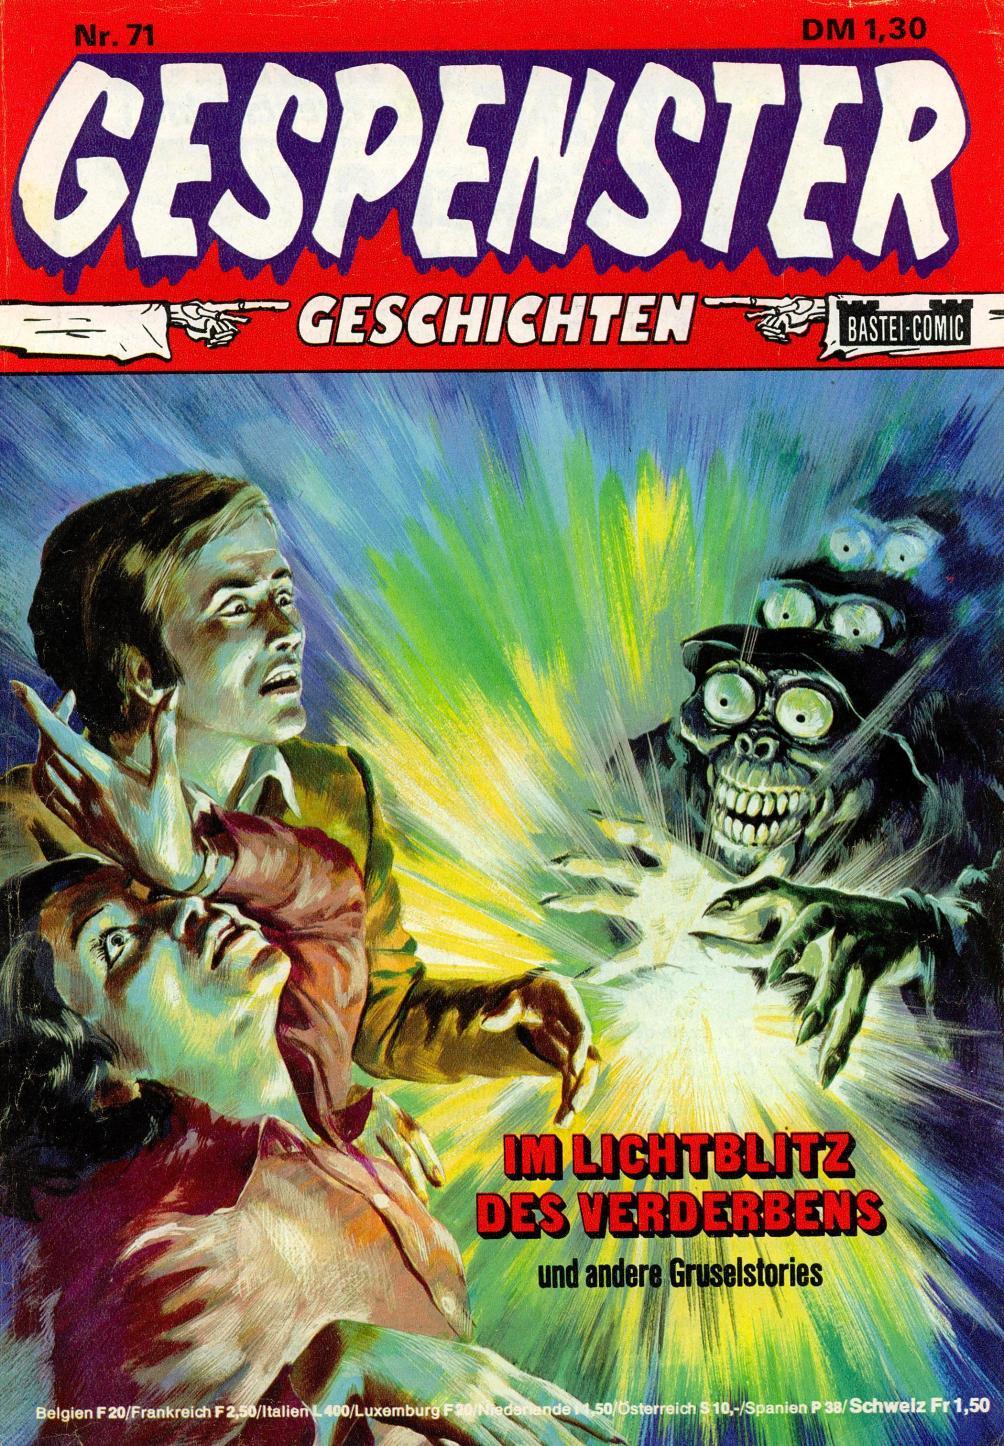 Gespenster Geschichten - 71